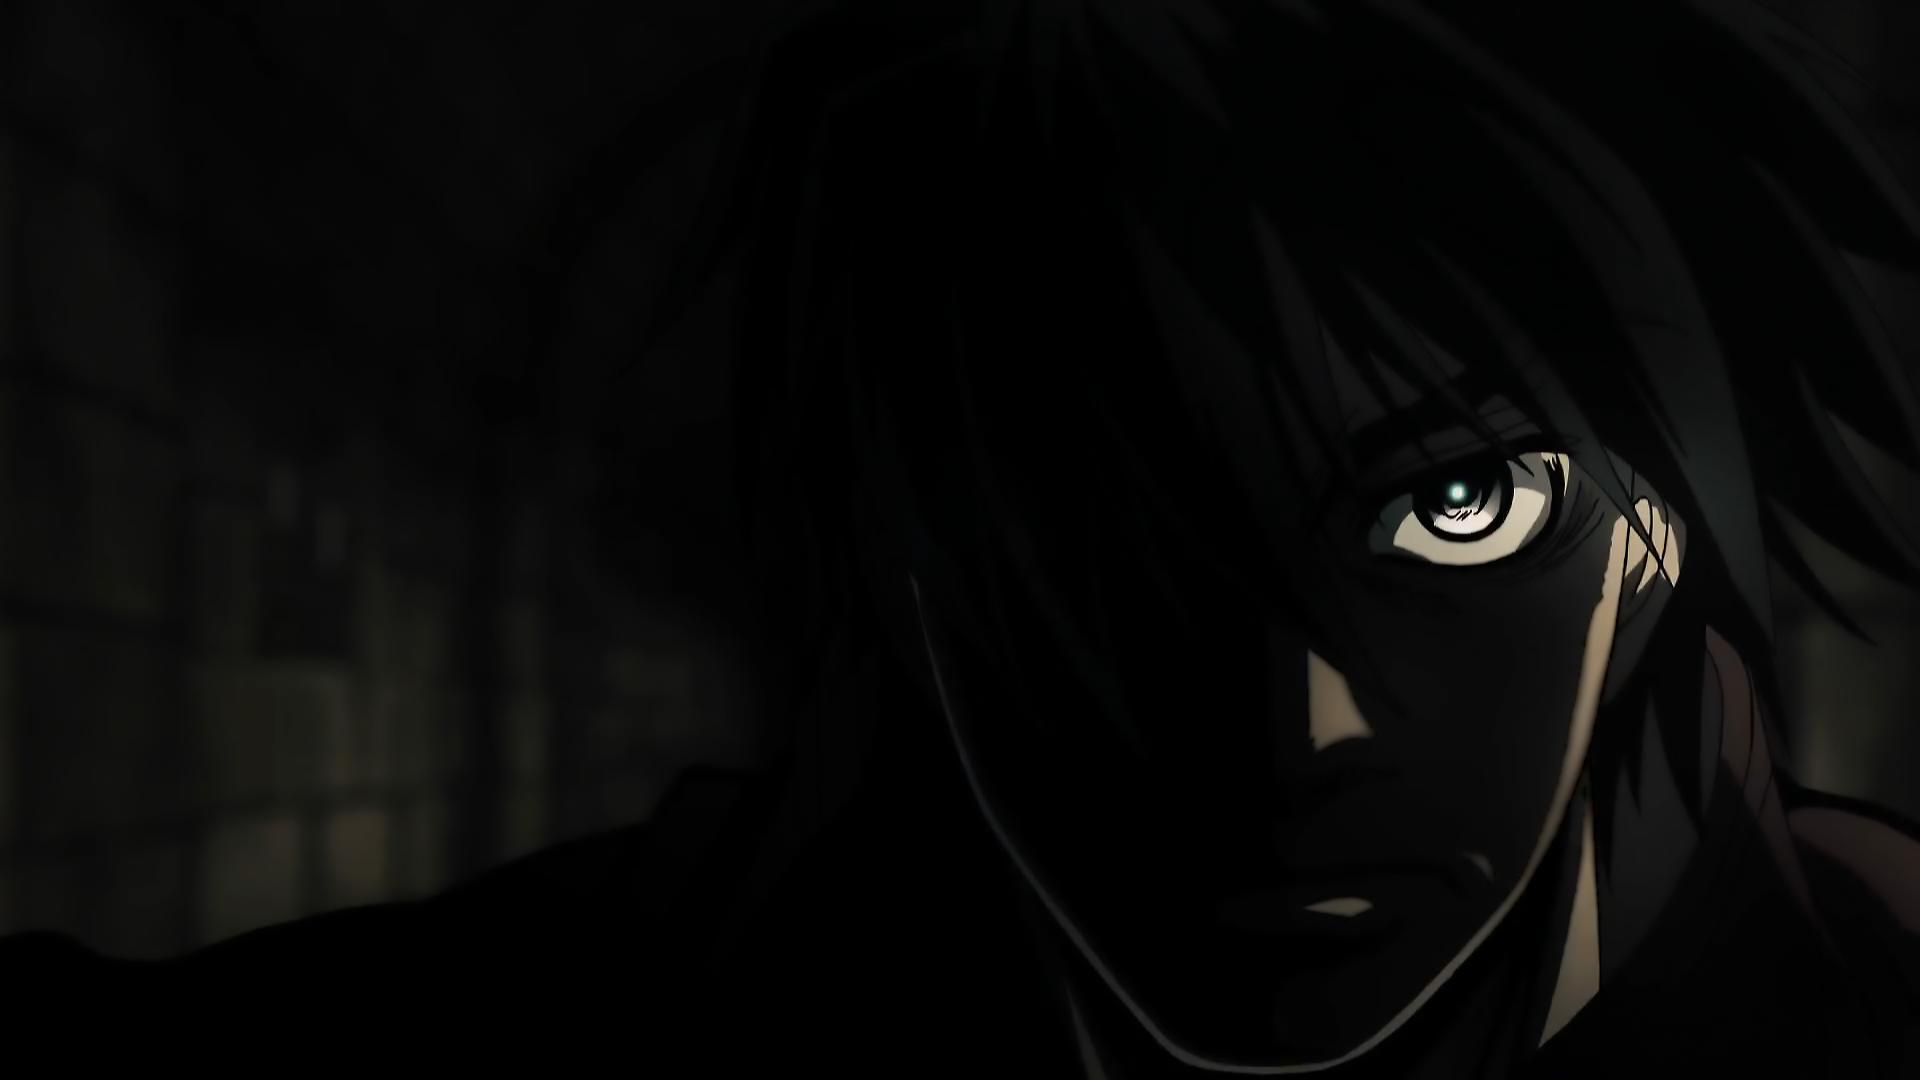 oscuro dark anime wallpaper: Sfondi : Monocromo, Anime, Drifters, Shimazu Toyohisa